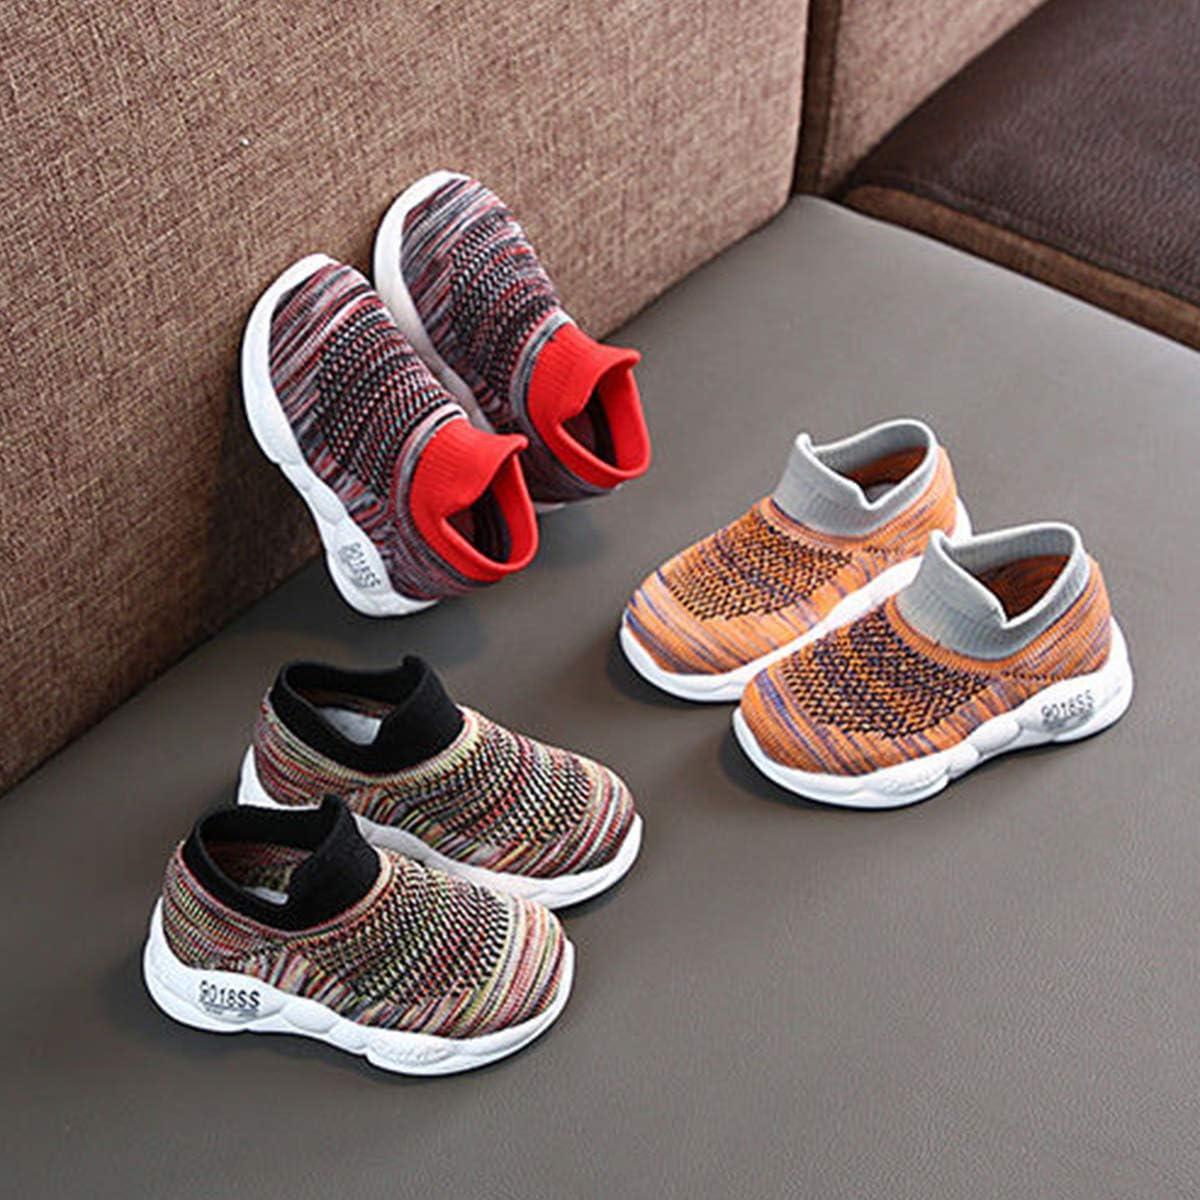 DEBAIJIA Zapatos para ni/ños 0-3T Beb/é Caminar Zapatillas Color S/ólido Suela Suave Malla Antideslizante PVC Material Ligero Transpirable